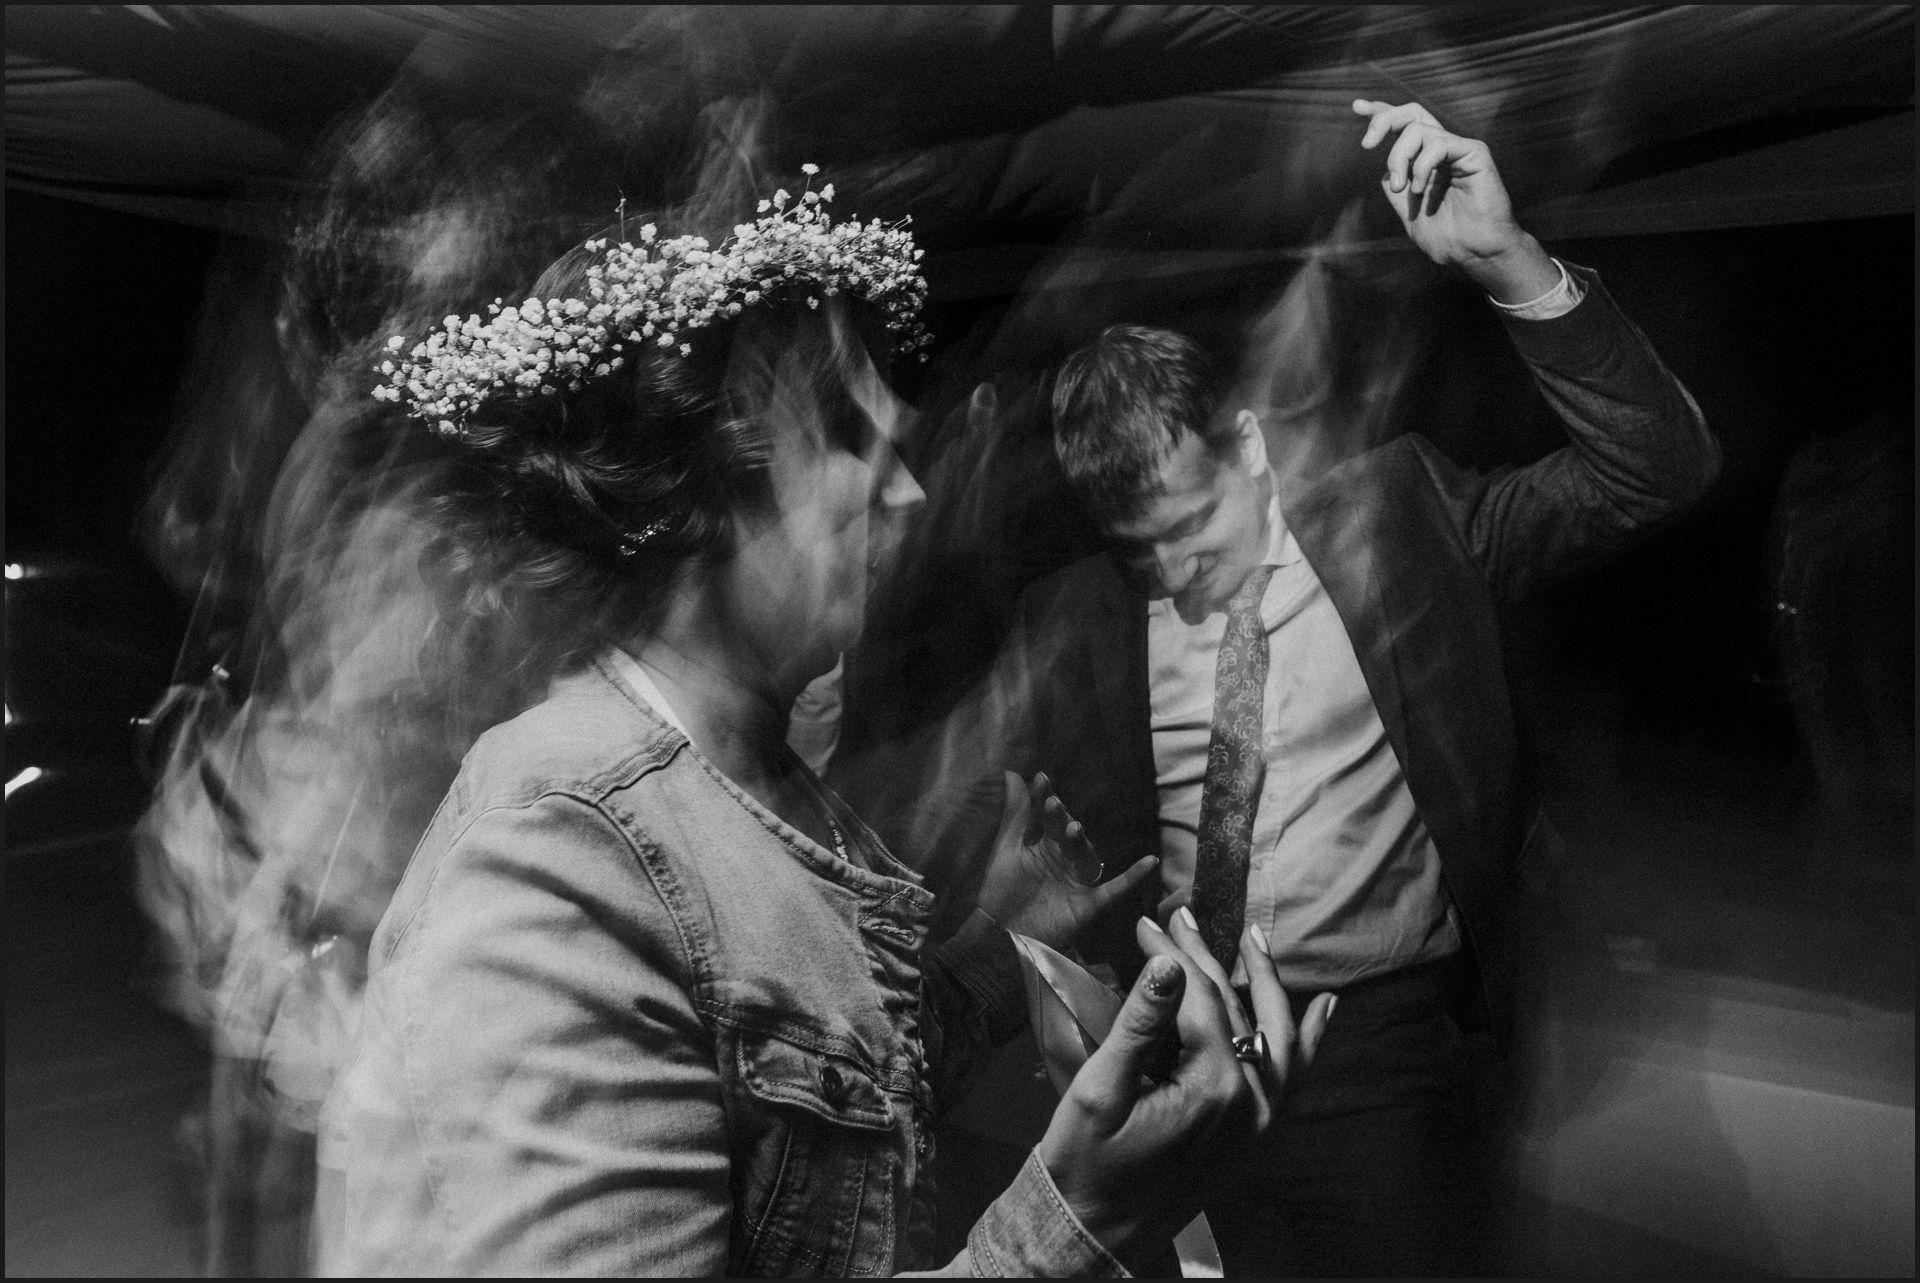 wedding, party, umbria, nikis resort, bride, groom, black and white